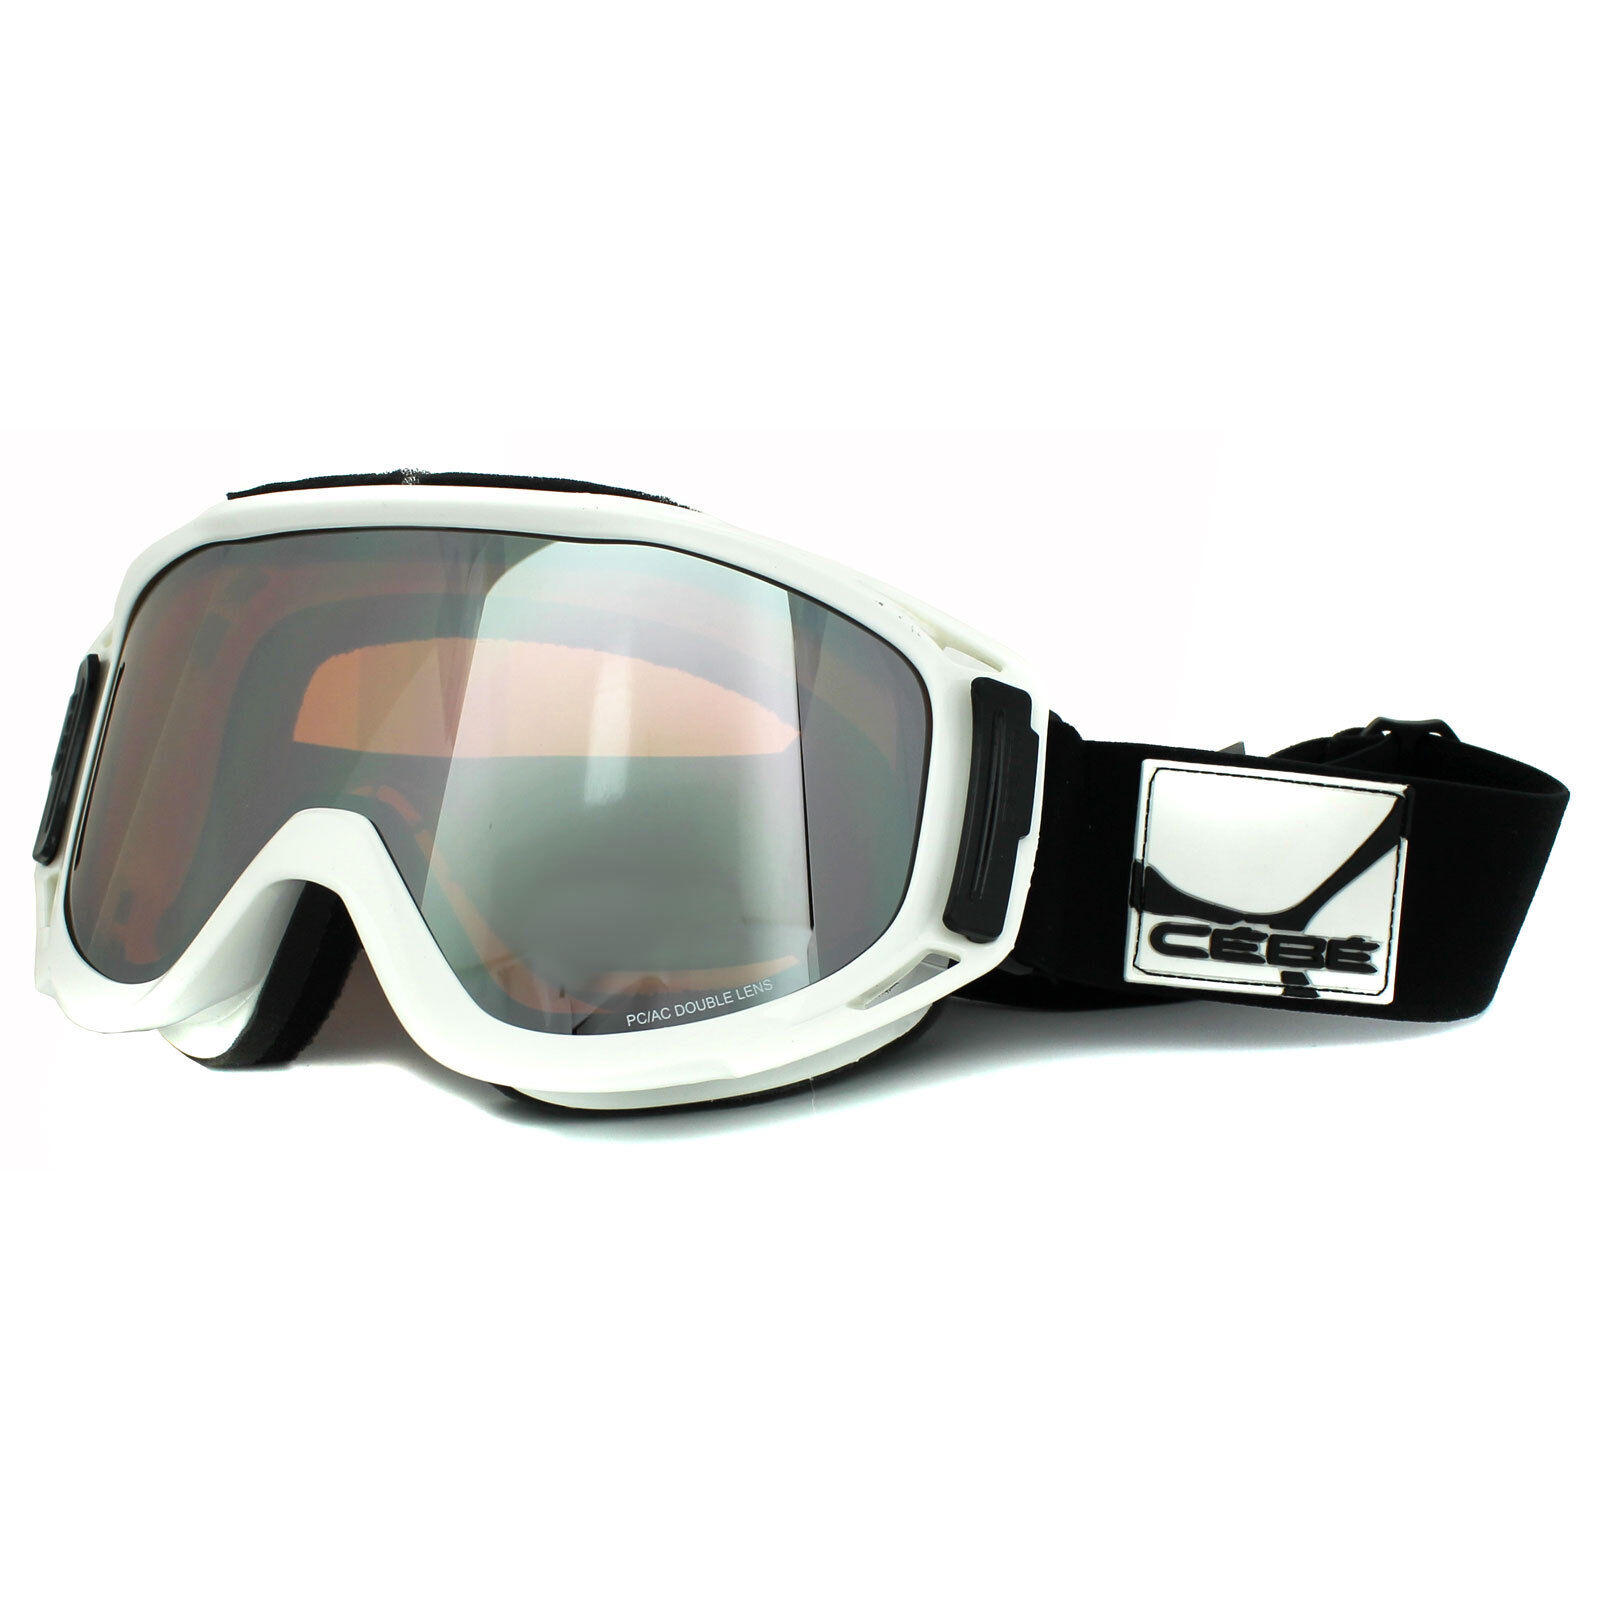 Cebe Ski Snow Goggles Legend 1570B013L White orange Flash Mirror Mens